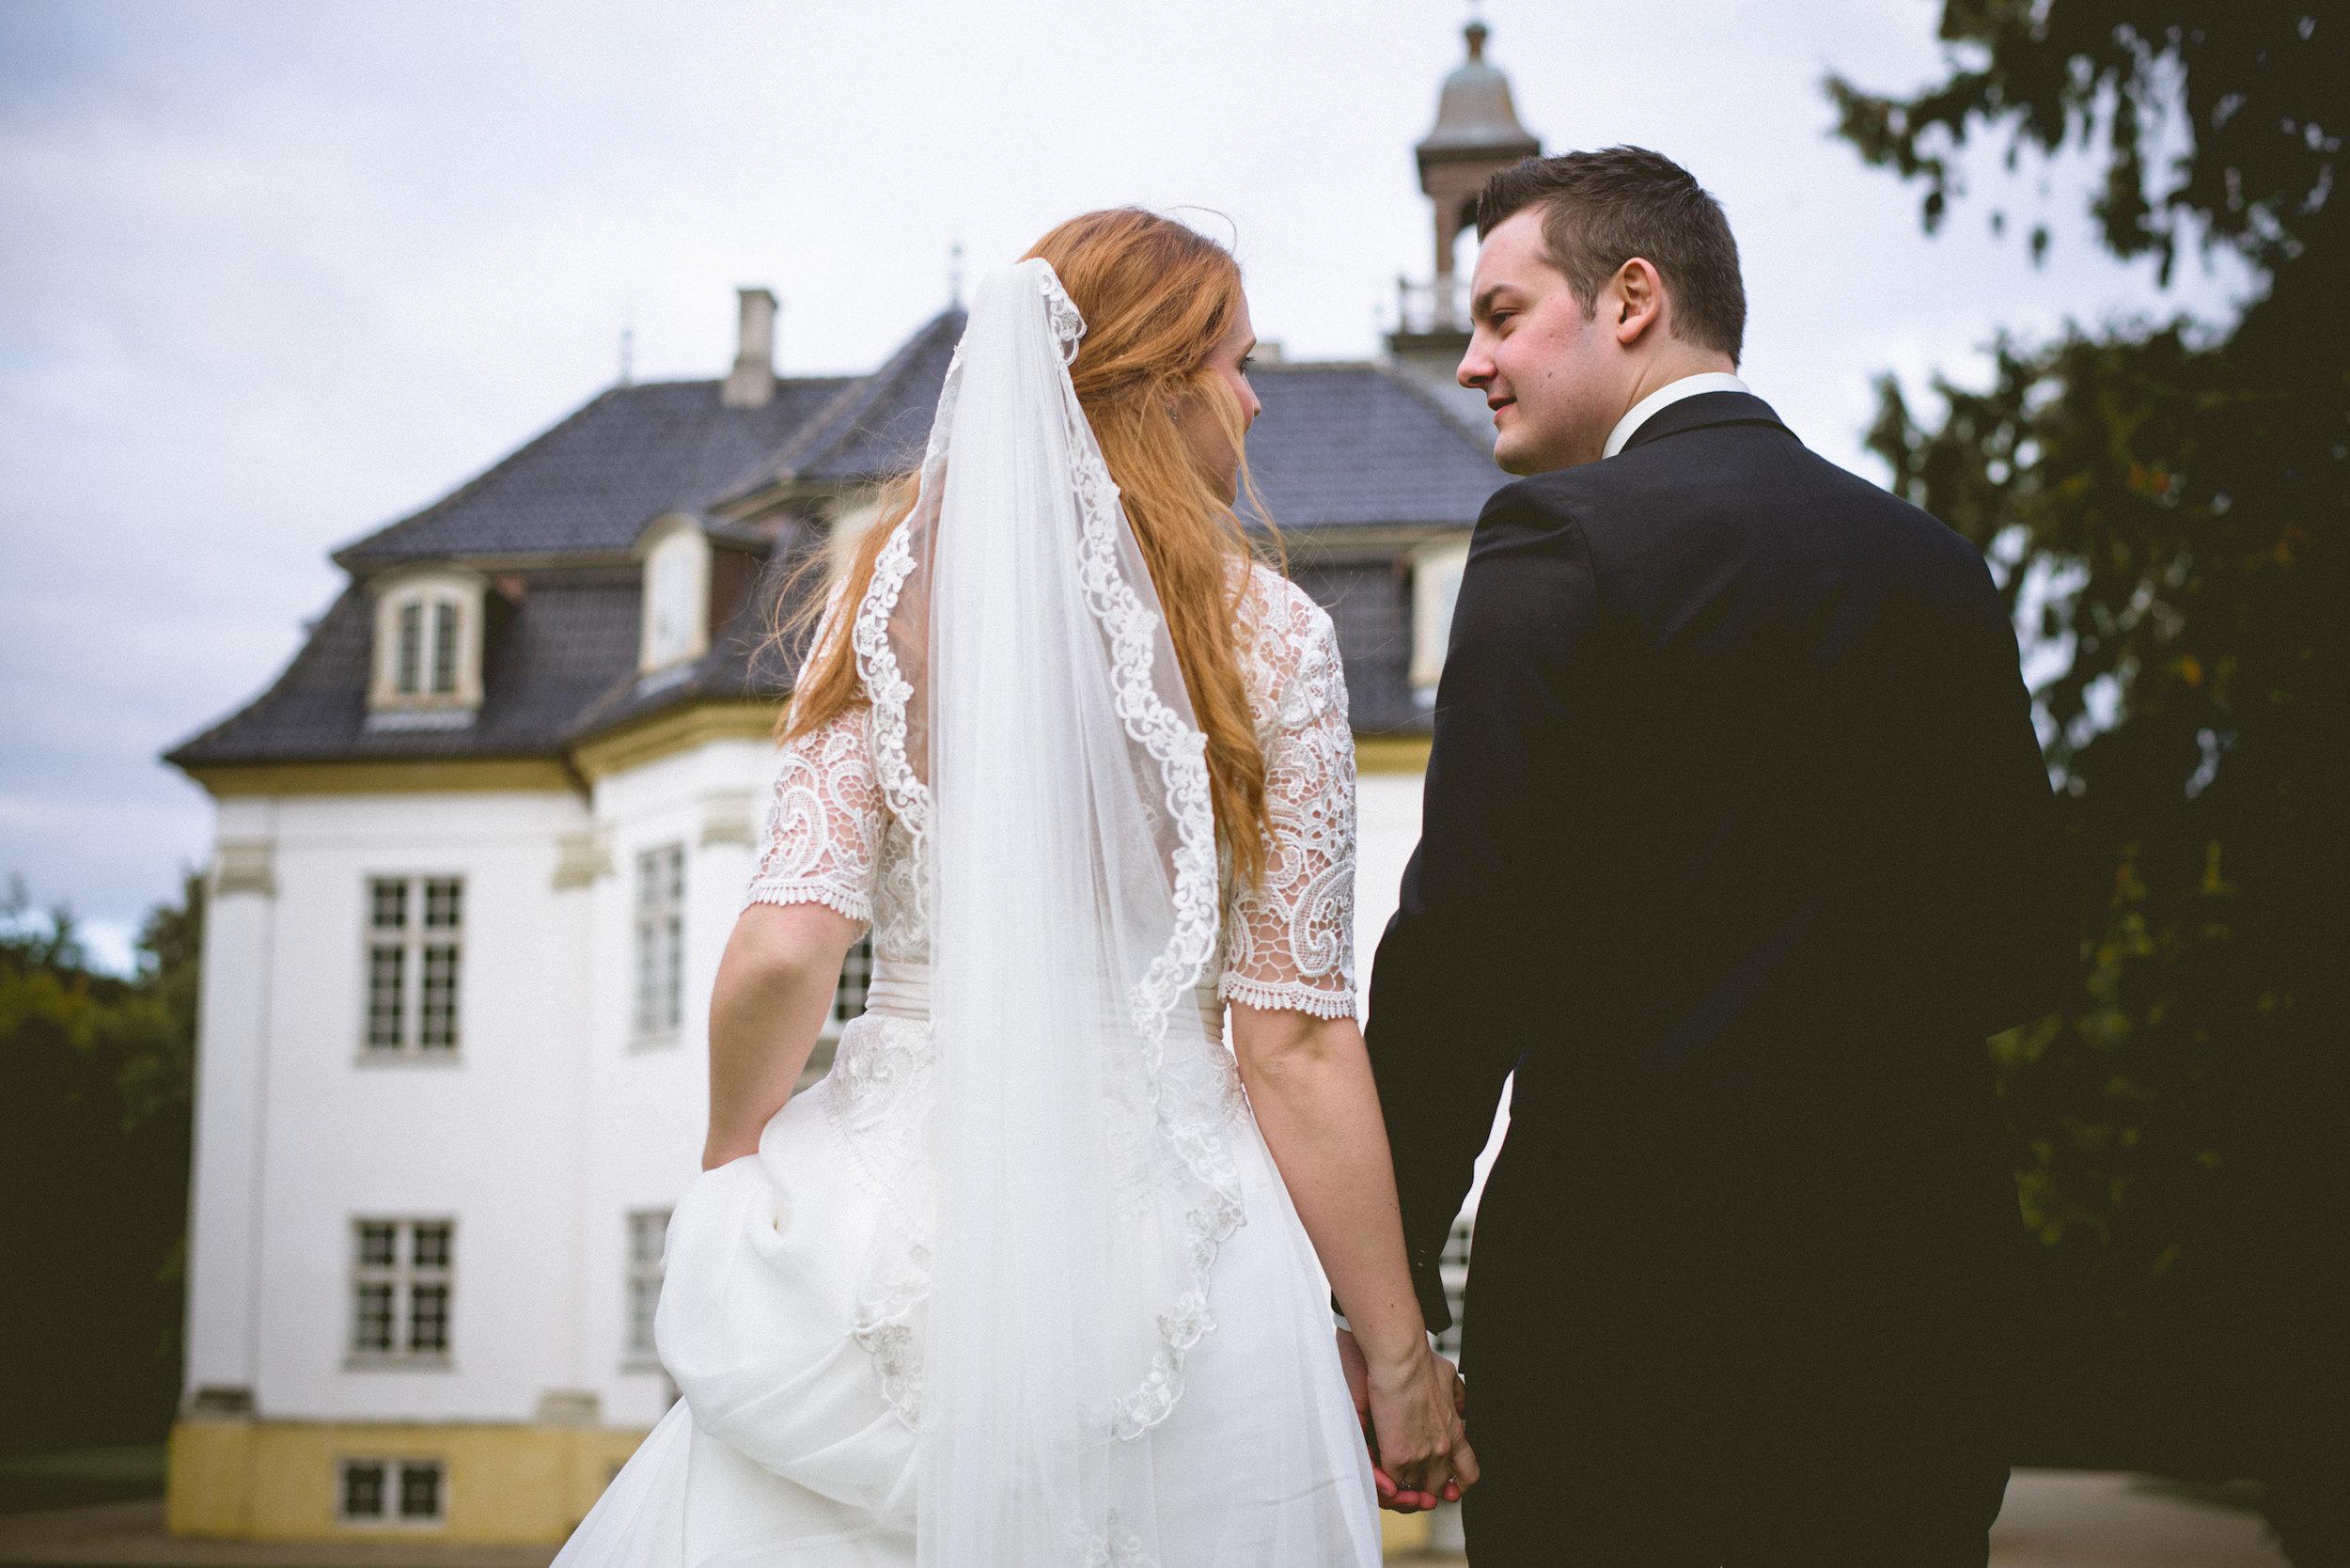 York Region Ontario Wedding Photographer - Bride + Groom-50.jpg